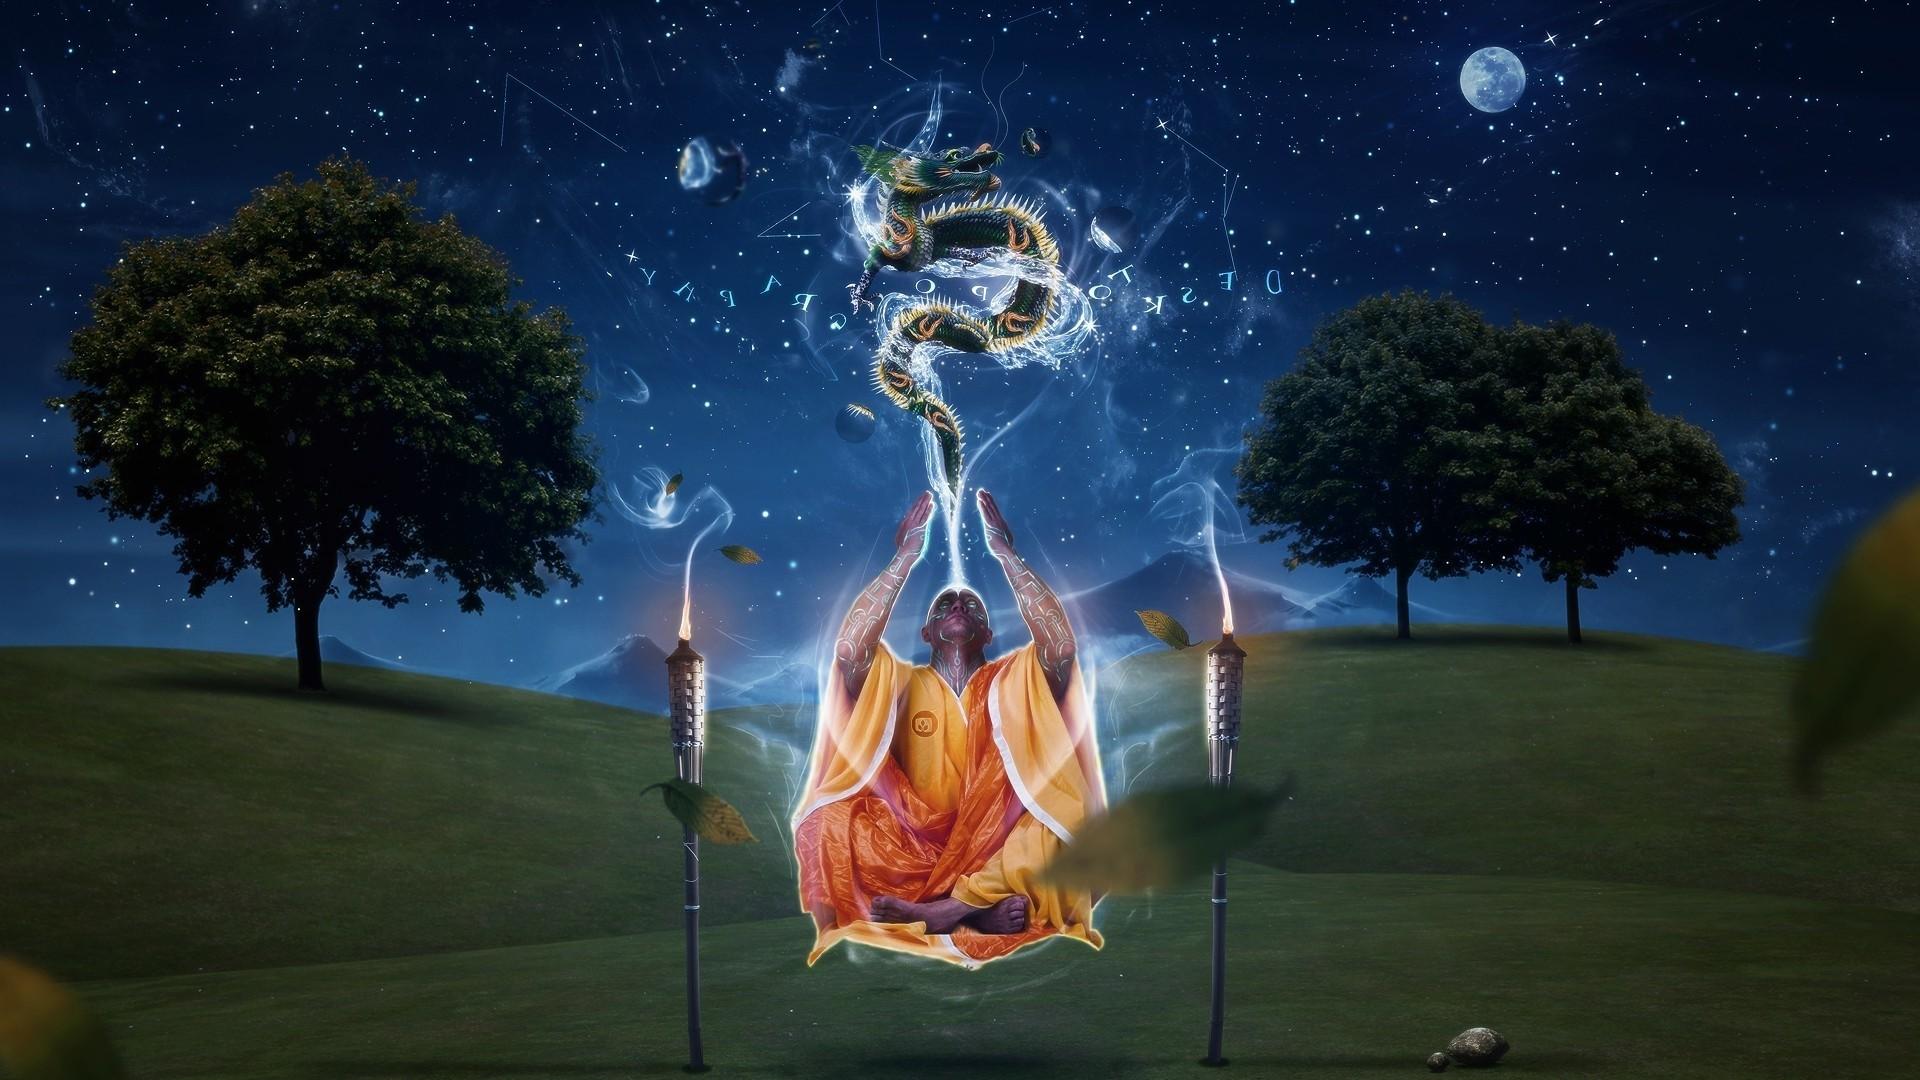 Spiritual Image